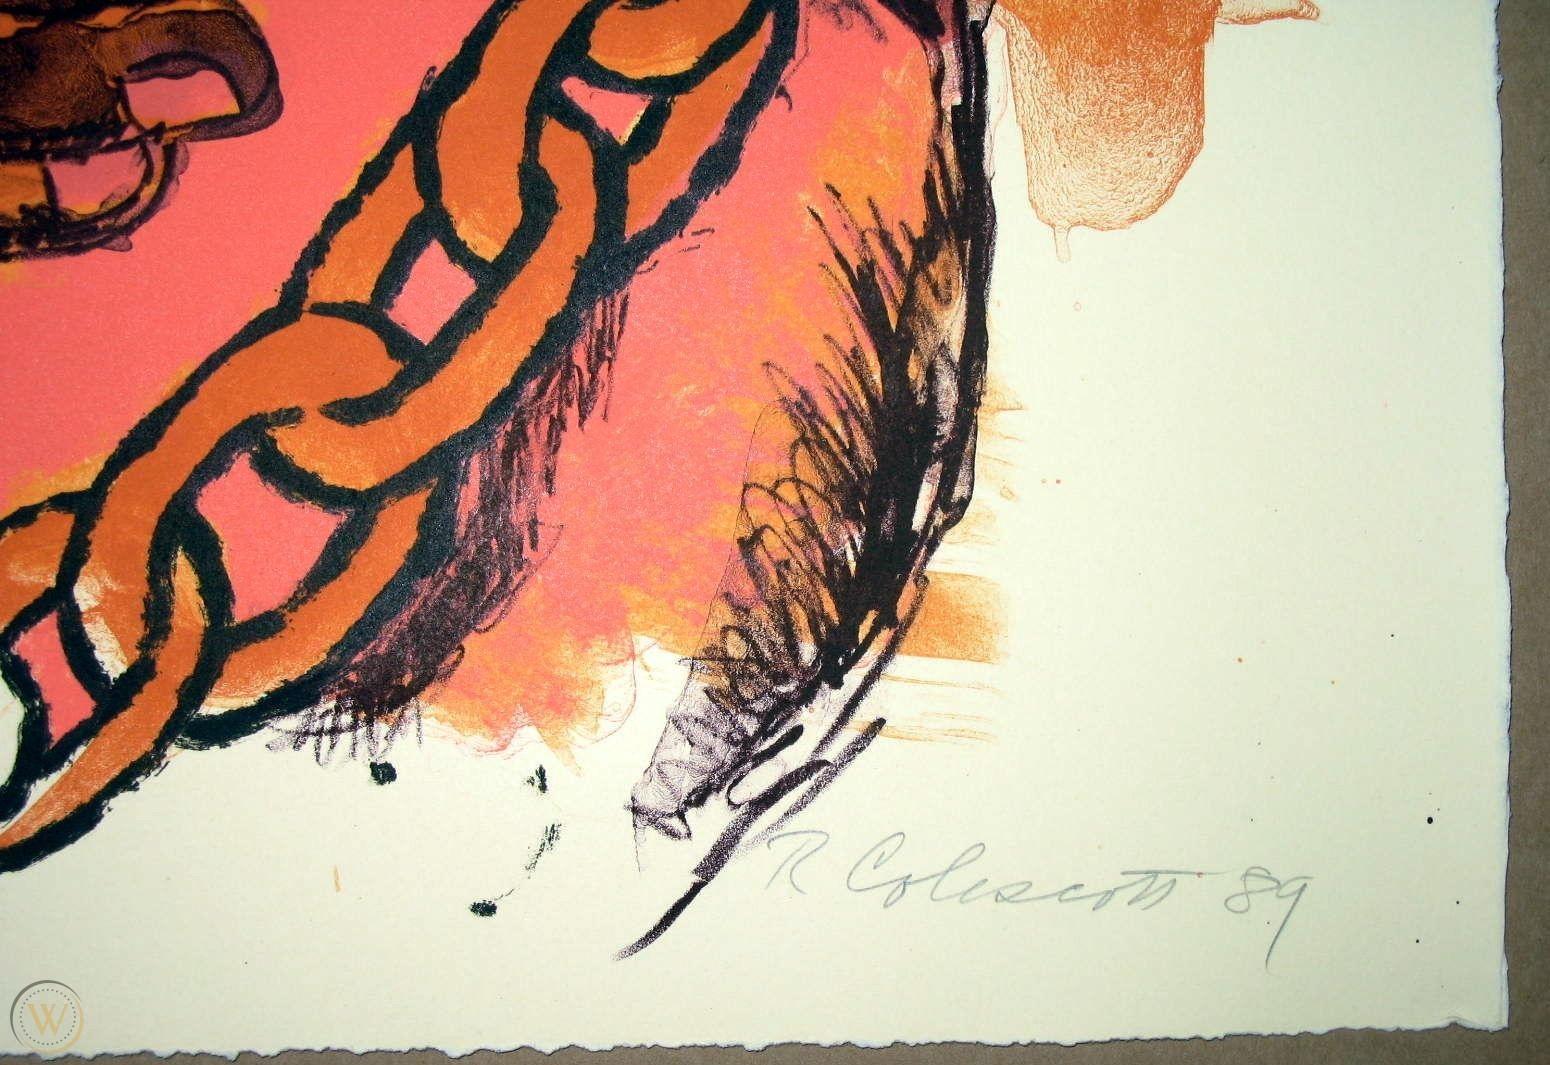 Signature Robert Colescott